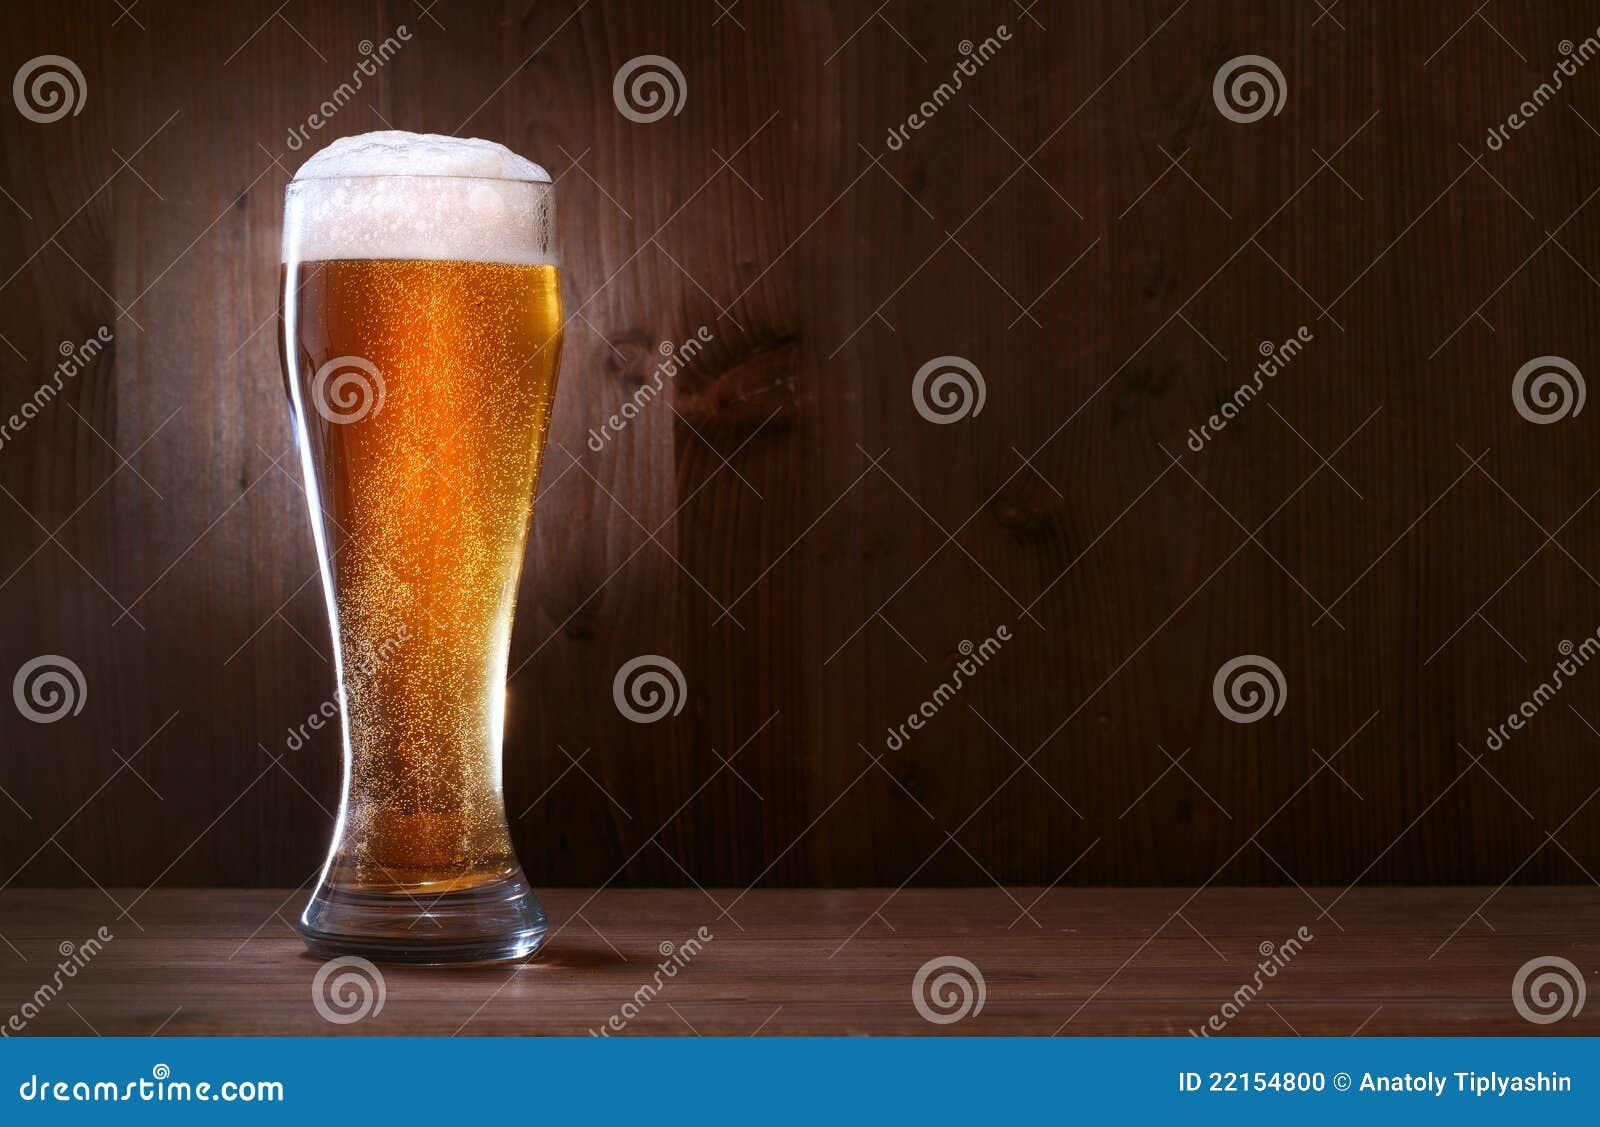 Cerveza de cristal en el fondo de madera